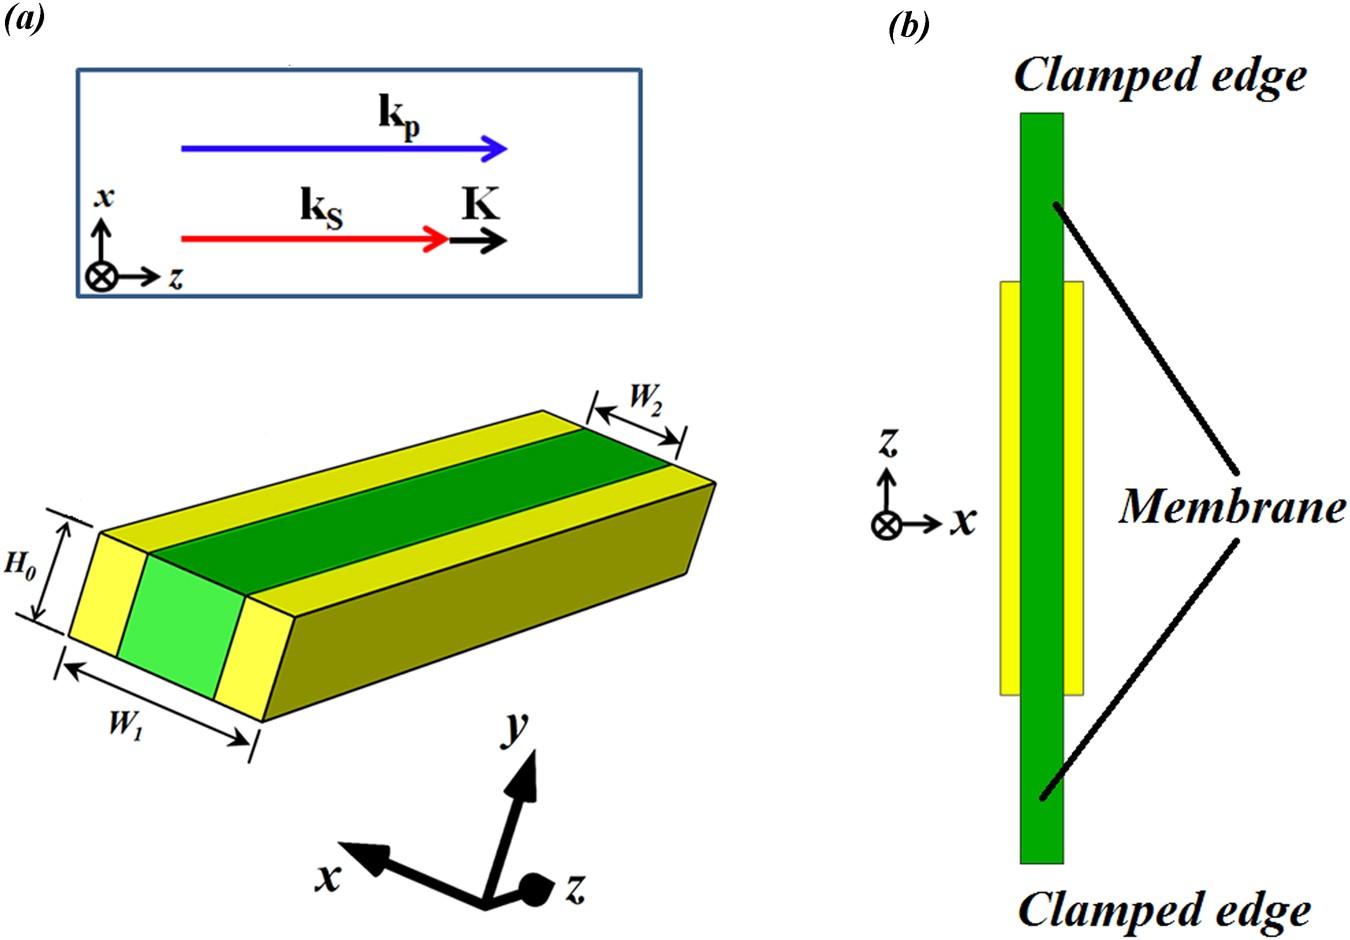 Plasmonic Waveguide Design For The Enhanced Forward Stimulated Ev10 Wiring Diagram Brillouin Scattering In Diamond Scientific Reports